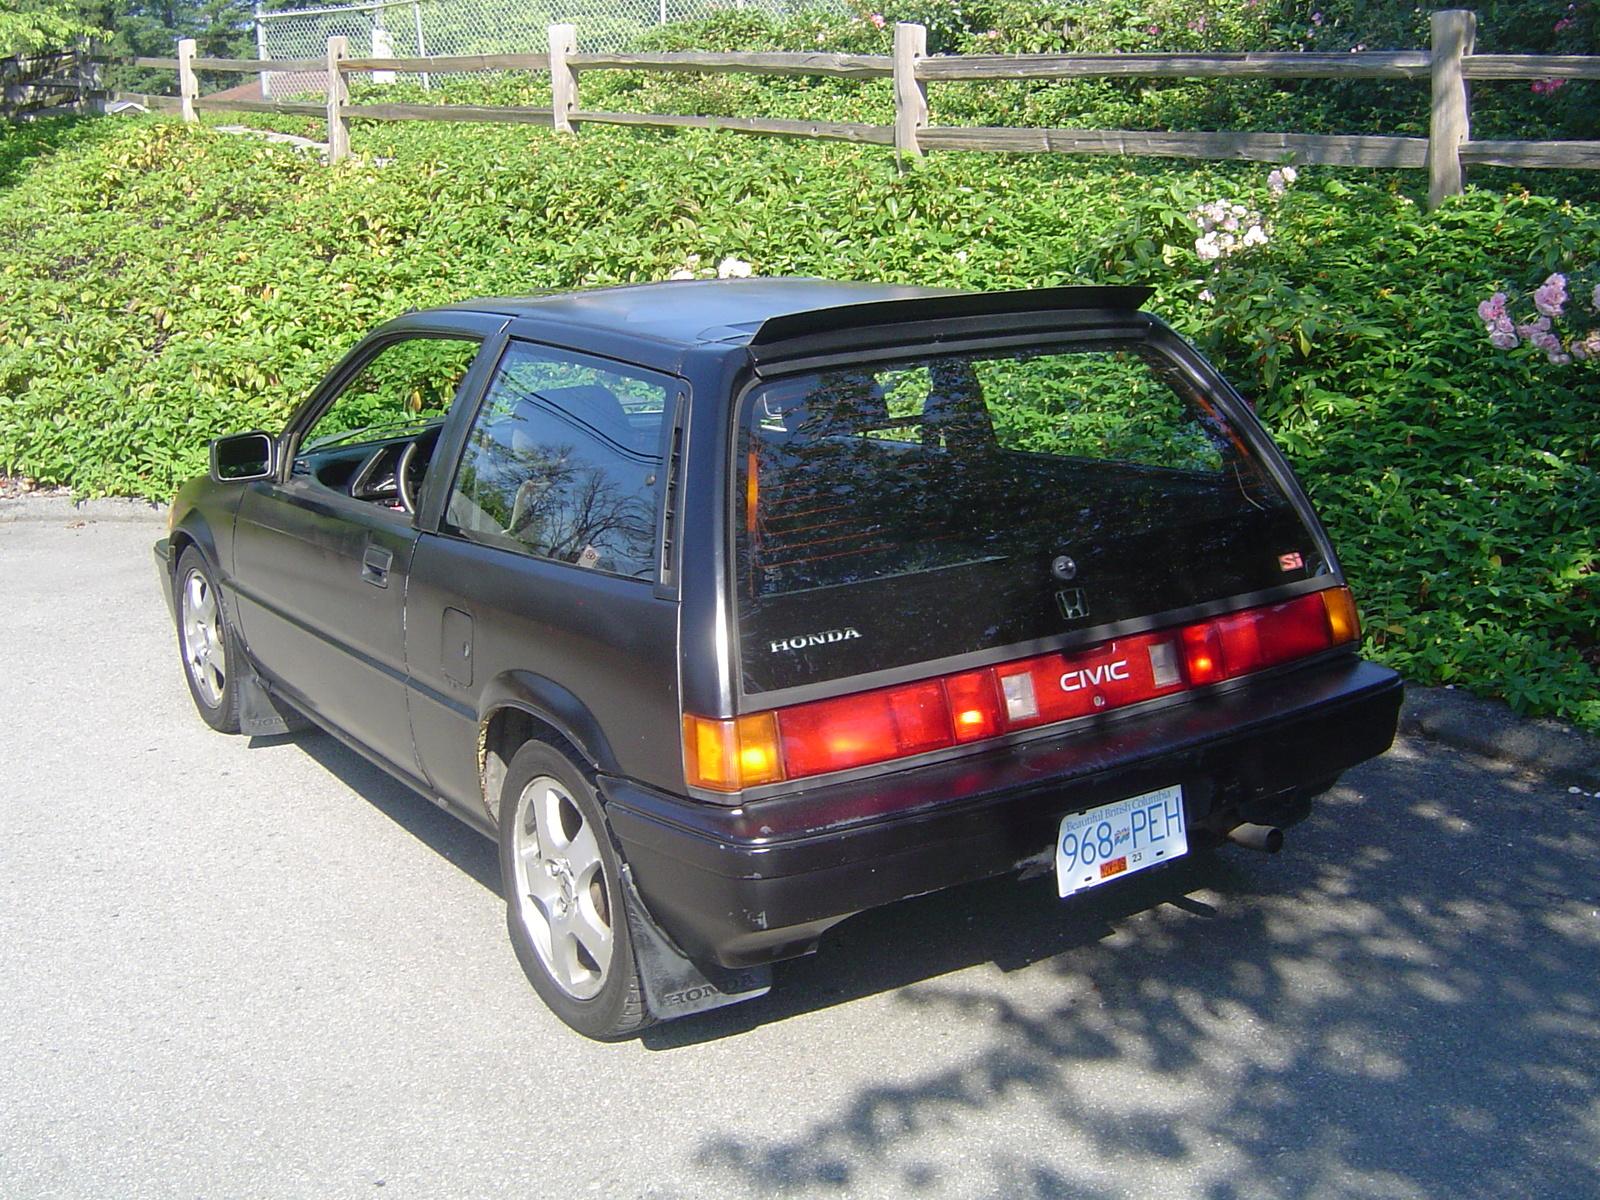 Crx Exhaust Bosal likewise Large additionally Honda Civic Dx Pic X likewise Honda Crx Hf Weld Racing Magnum Wheels furthermore Blf Hx S Cf. on 1989 honda crx hf